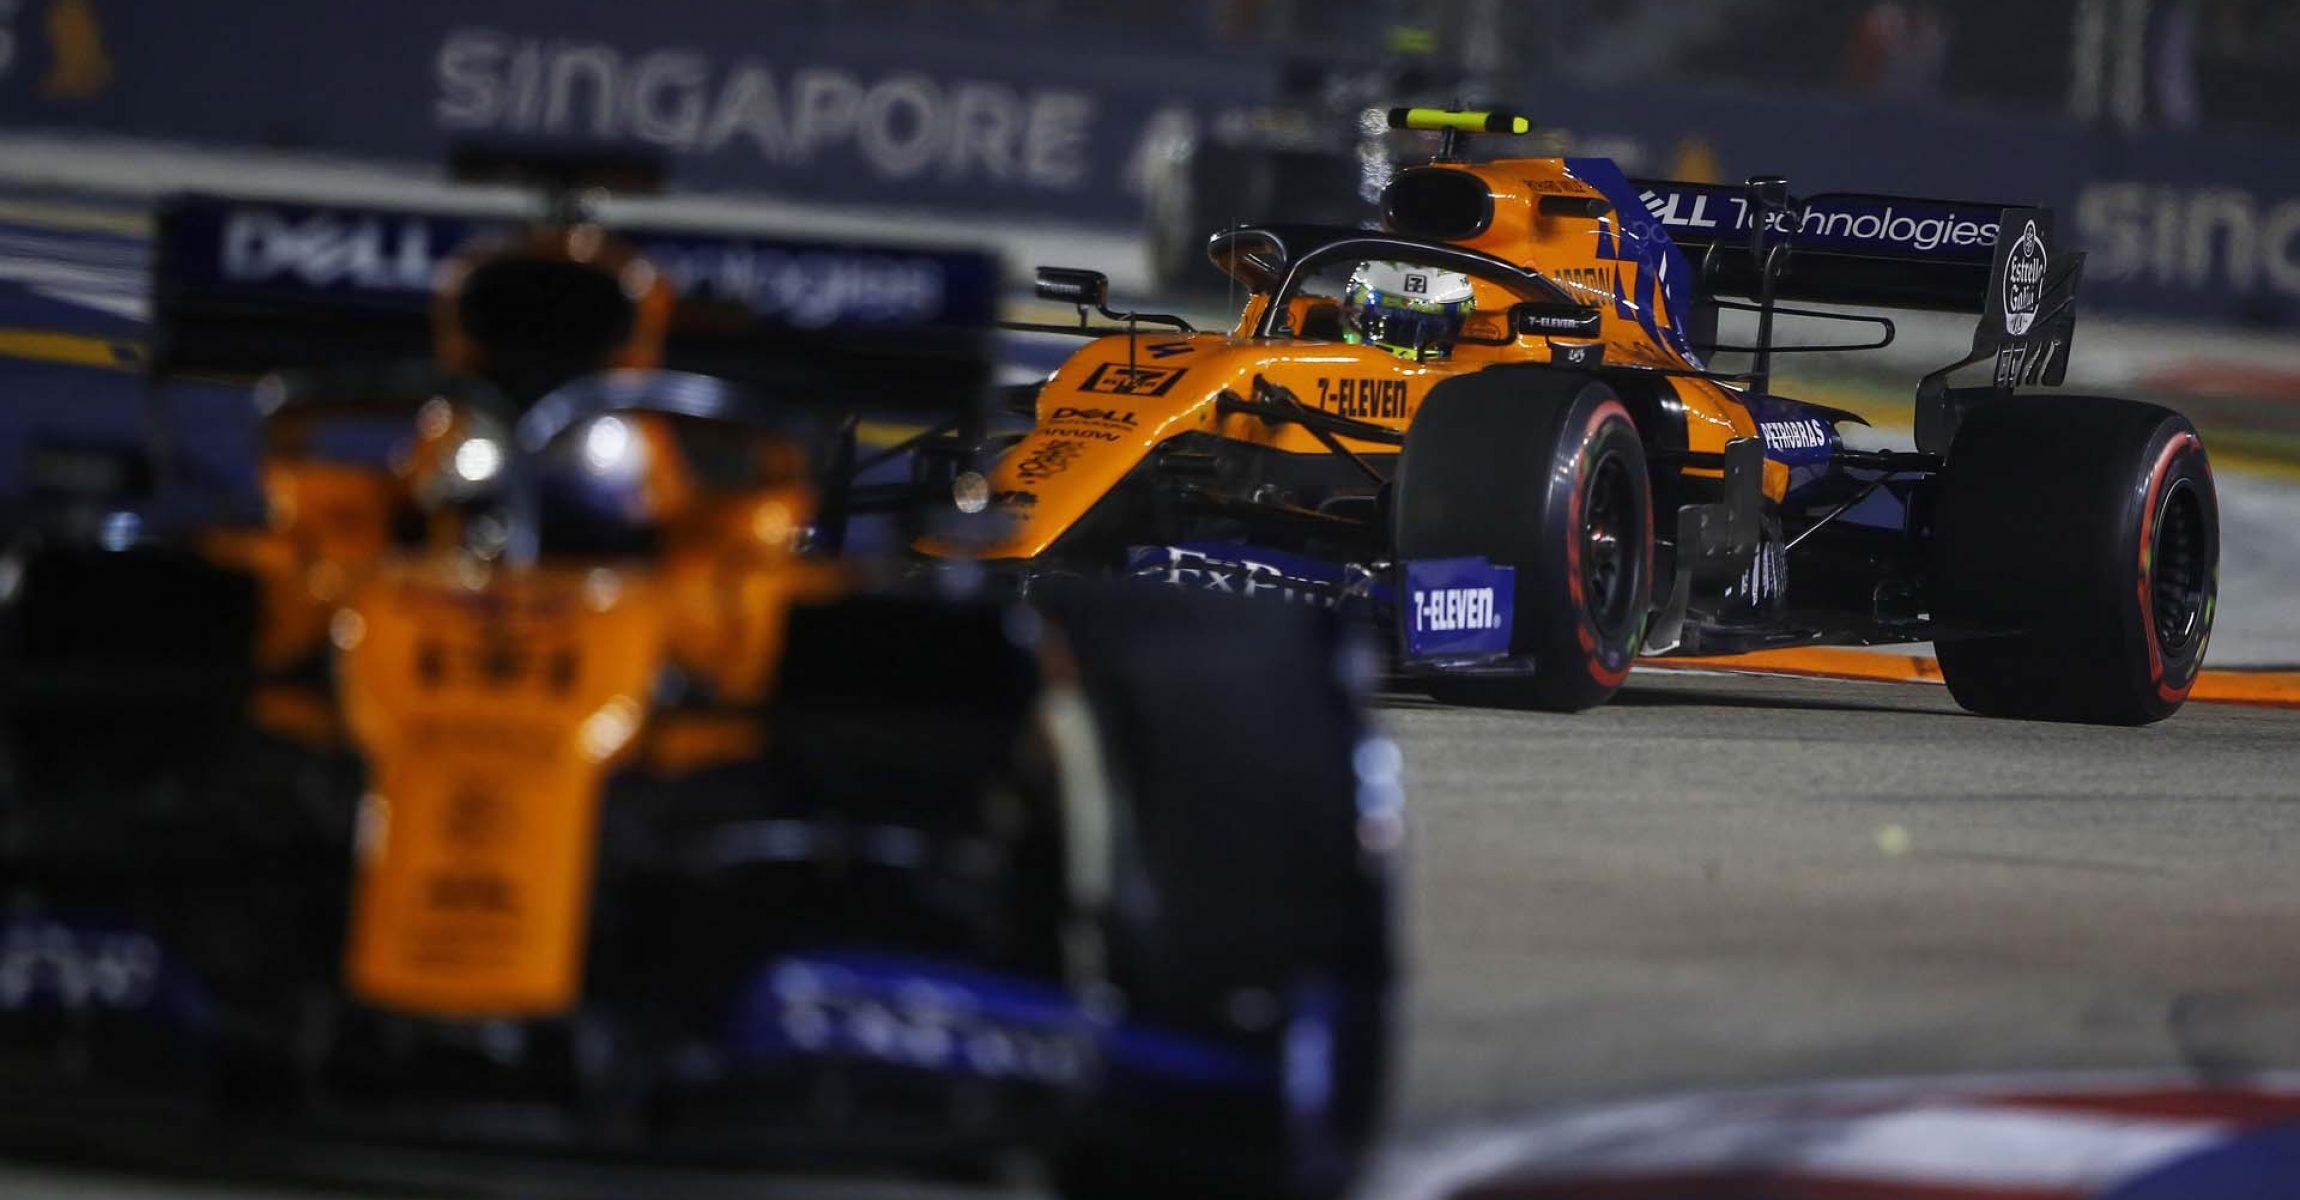 Carlos Sainz, McLaren MCL34 leads Lando Norris, McLaren MCL34